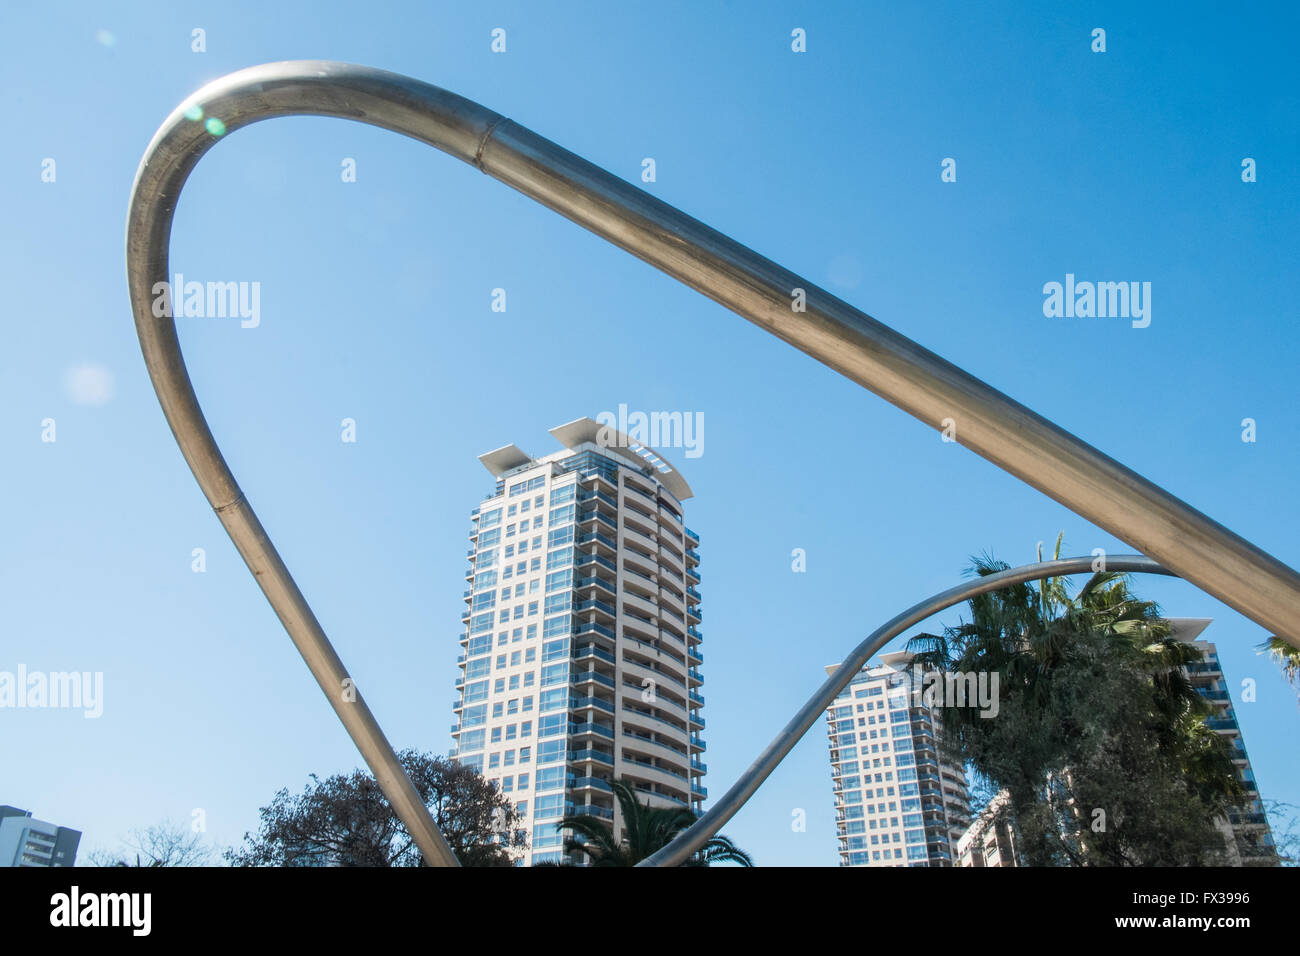 Tubular Structures in Parc,Park Diagonal Mar, Barcelona, Spain.Barcelona,Catalonia,Spain,Europe. Stock Photo